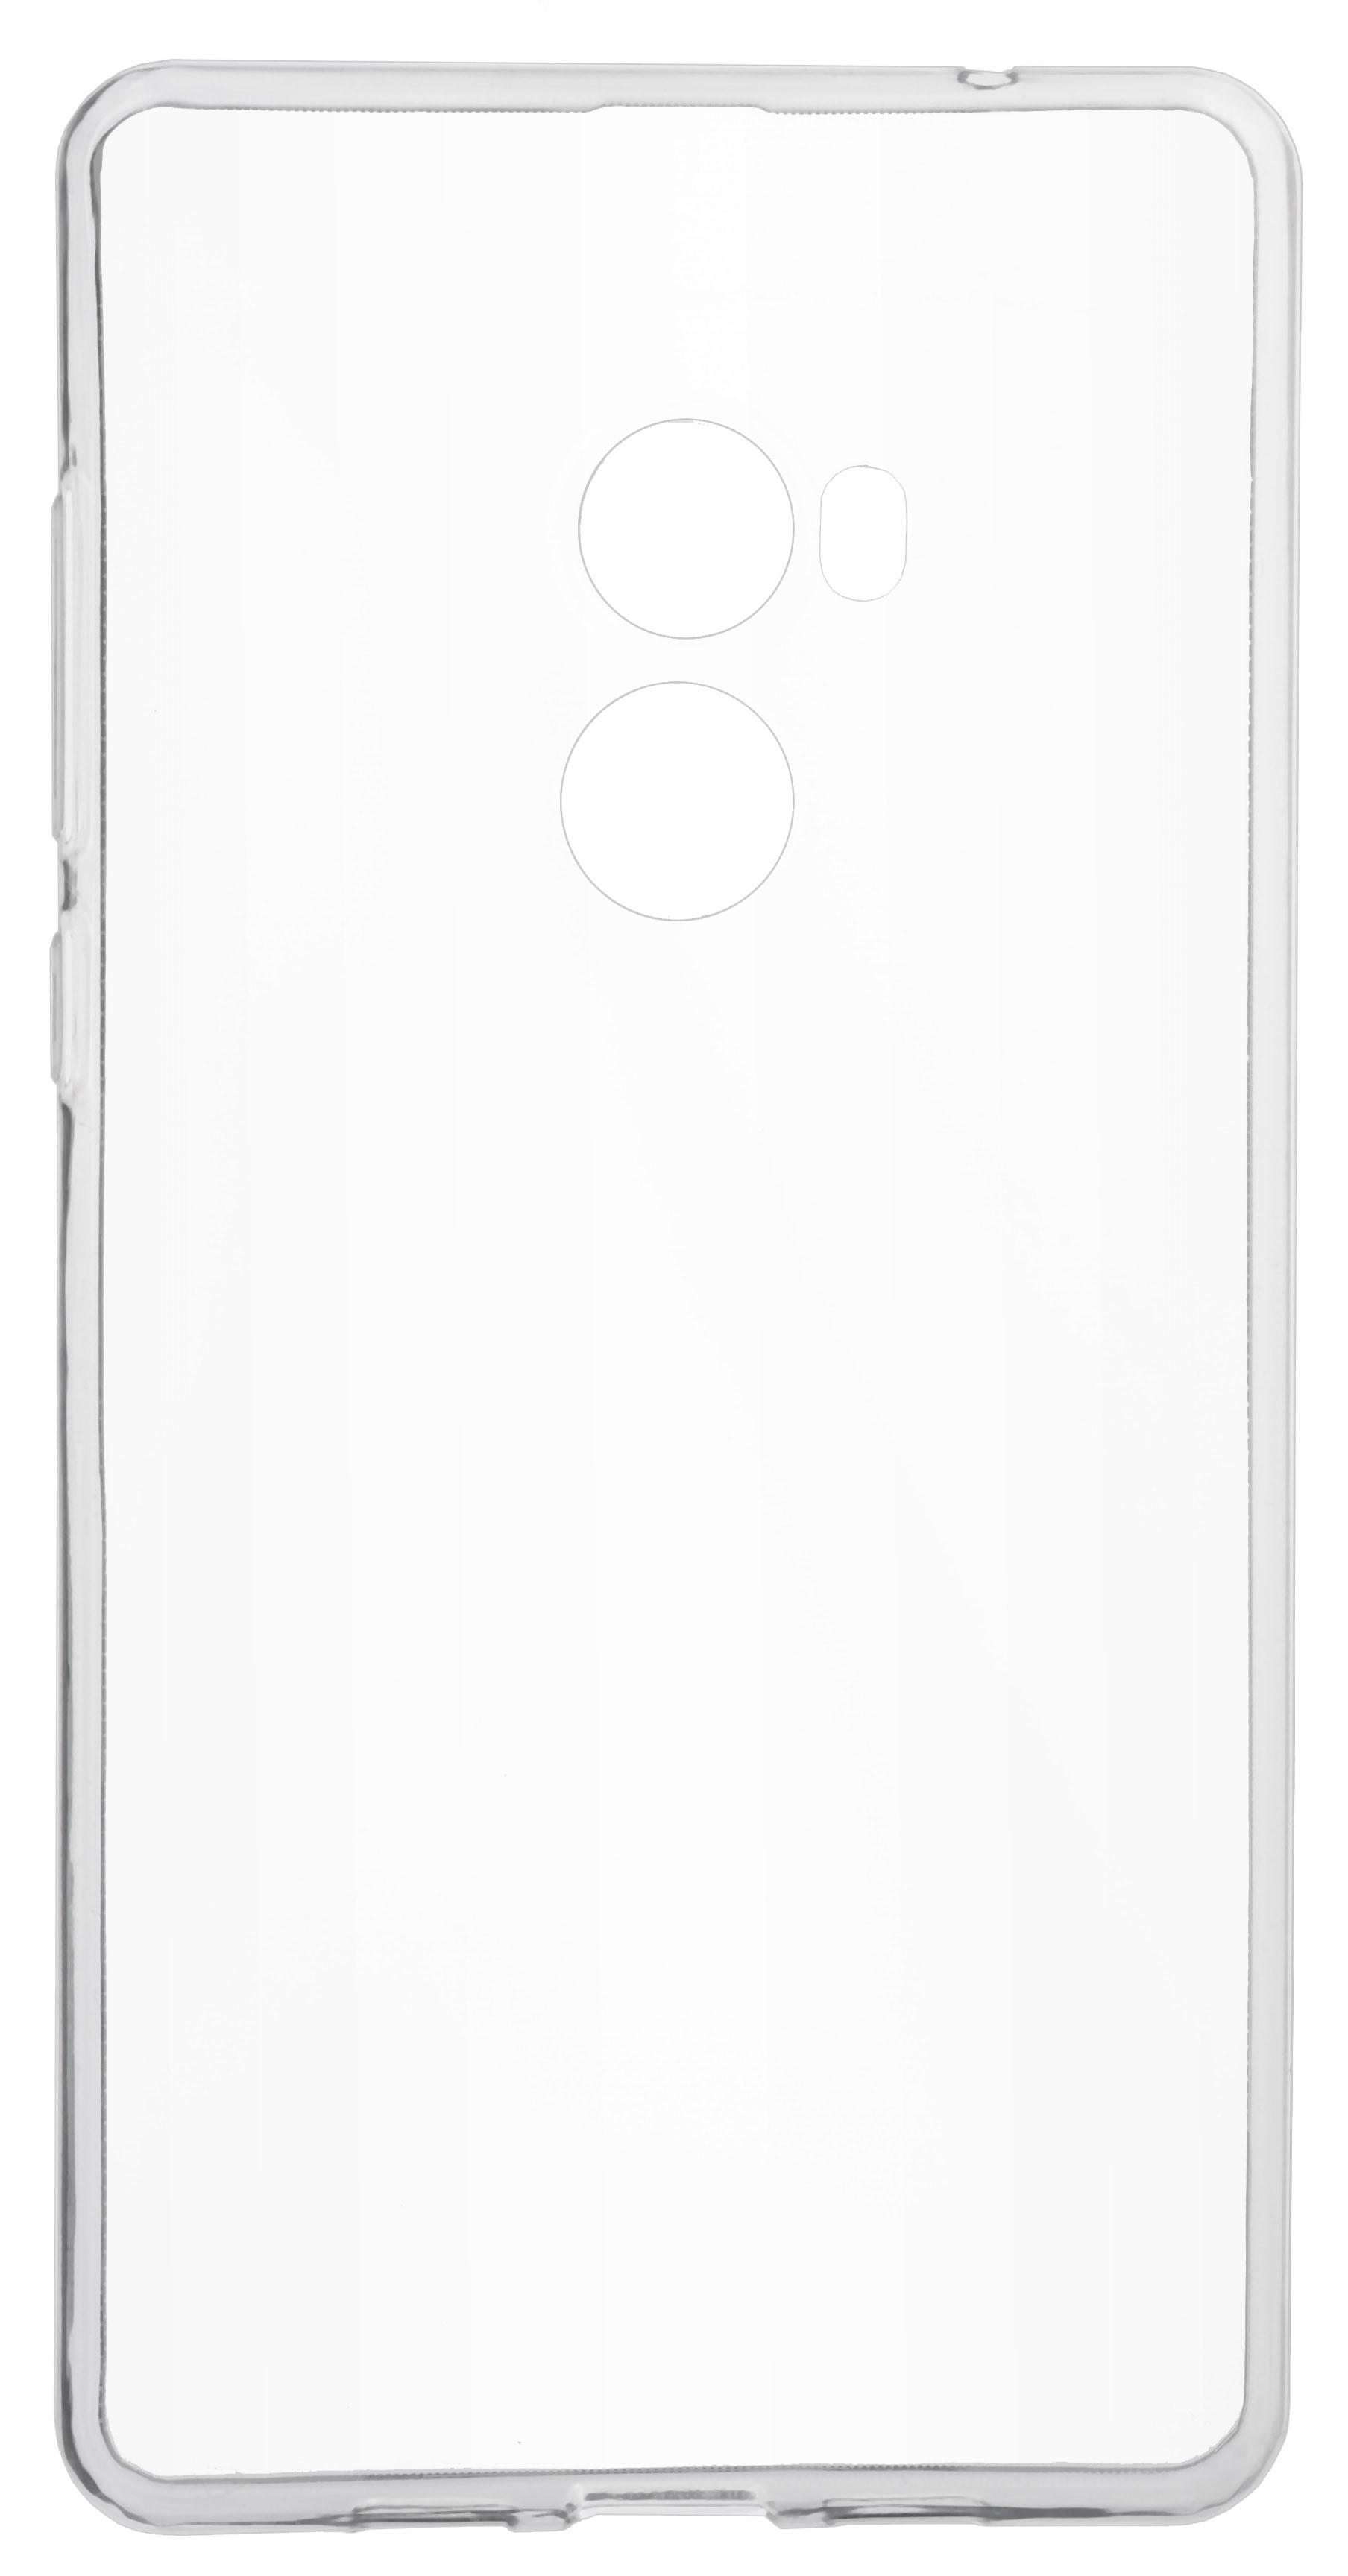 Чехол для сотового телефона skinBOX Slim Silicone, 4630042529823, прозрачный цена и фото